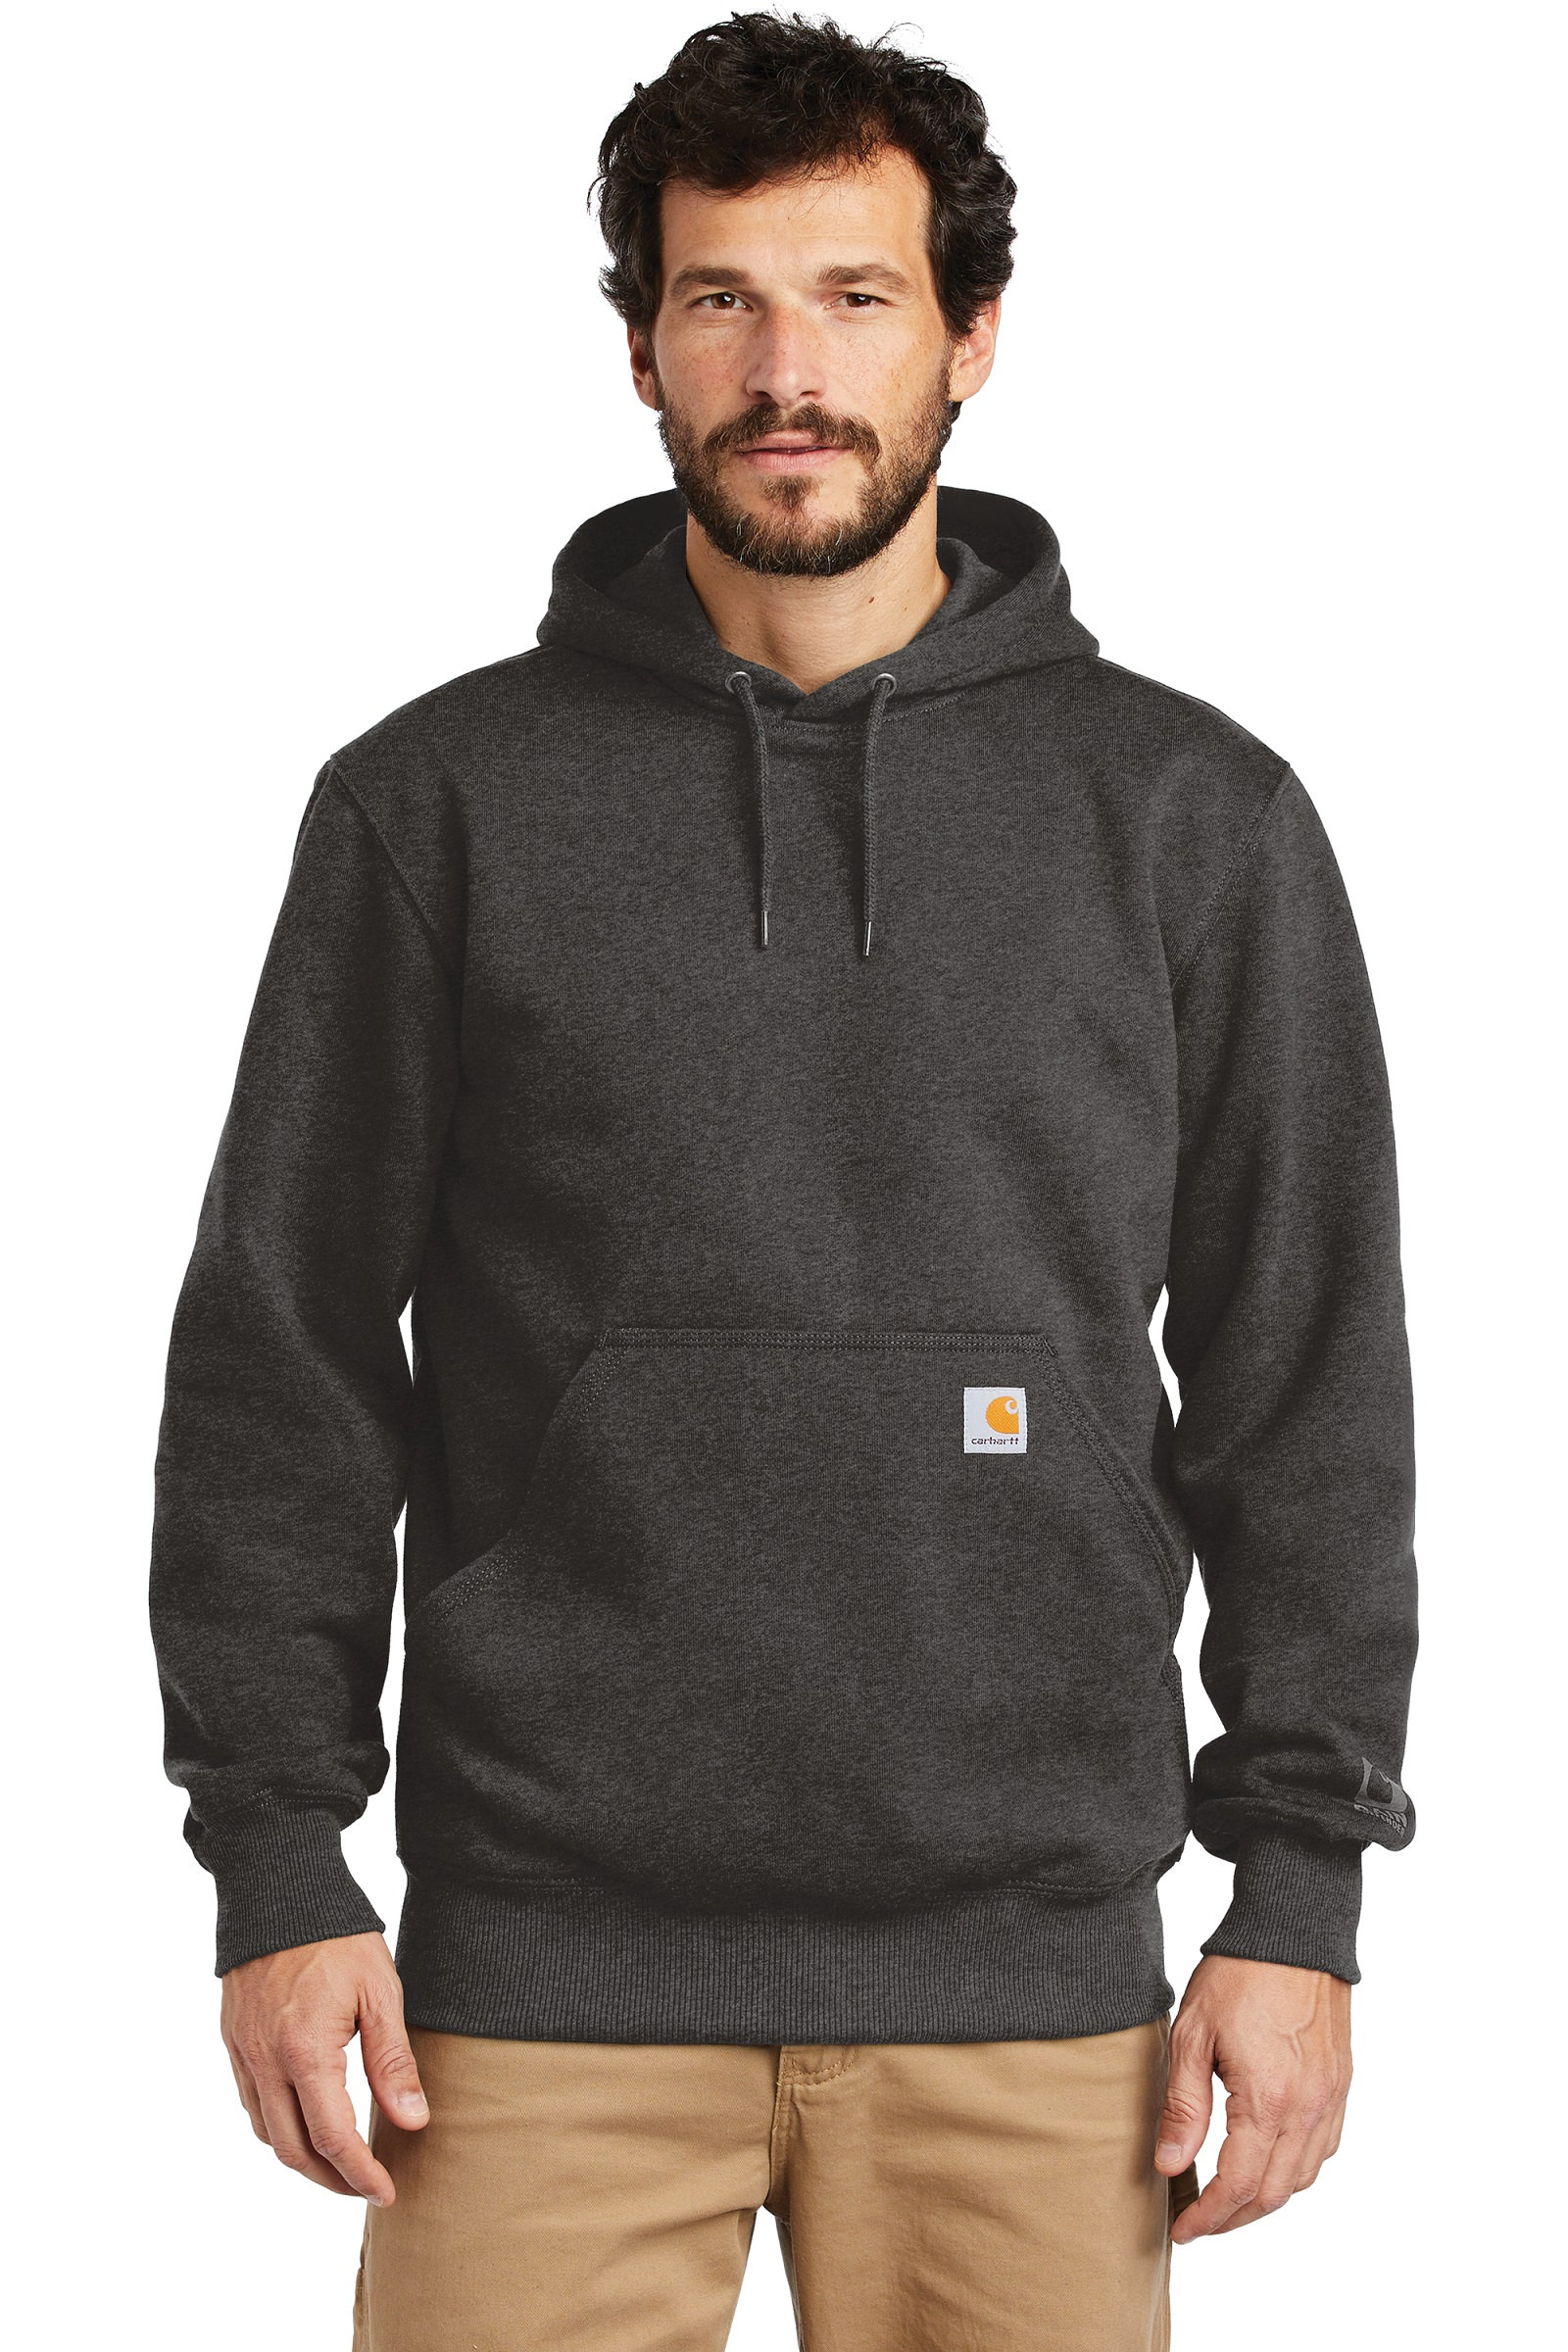 Carhartt Embroidered Rain Defender Paxton Heavyweight Hooded Sweatshirt